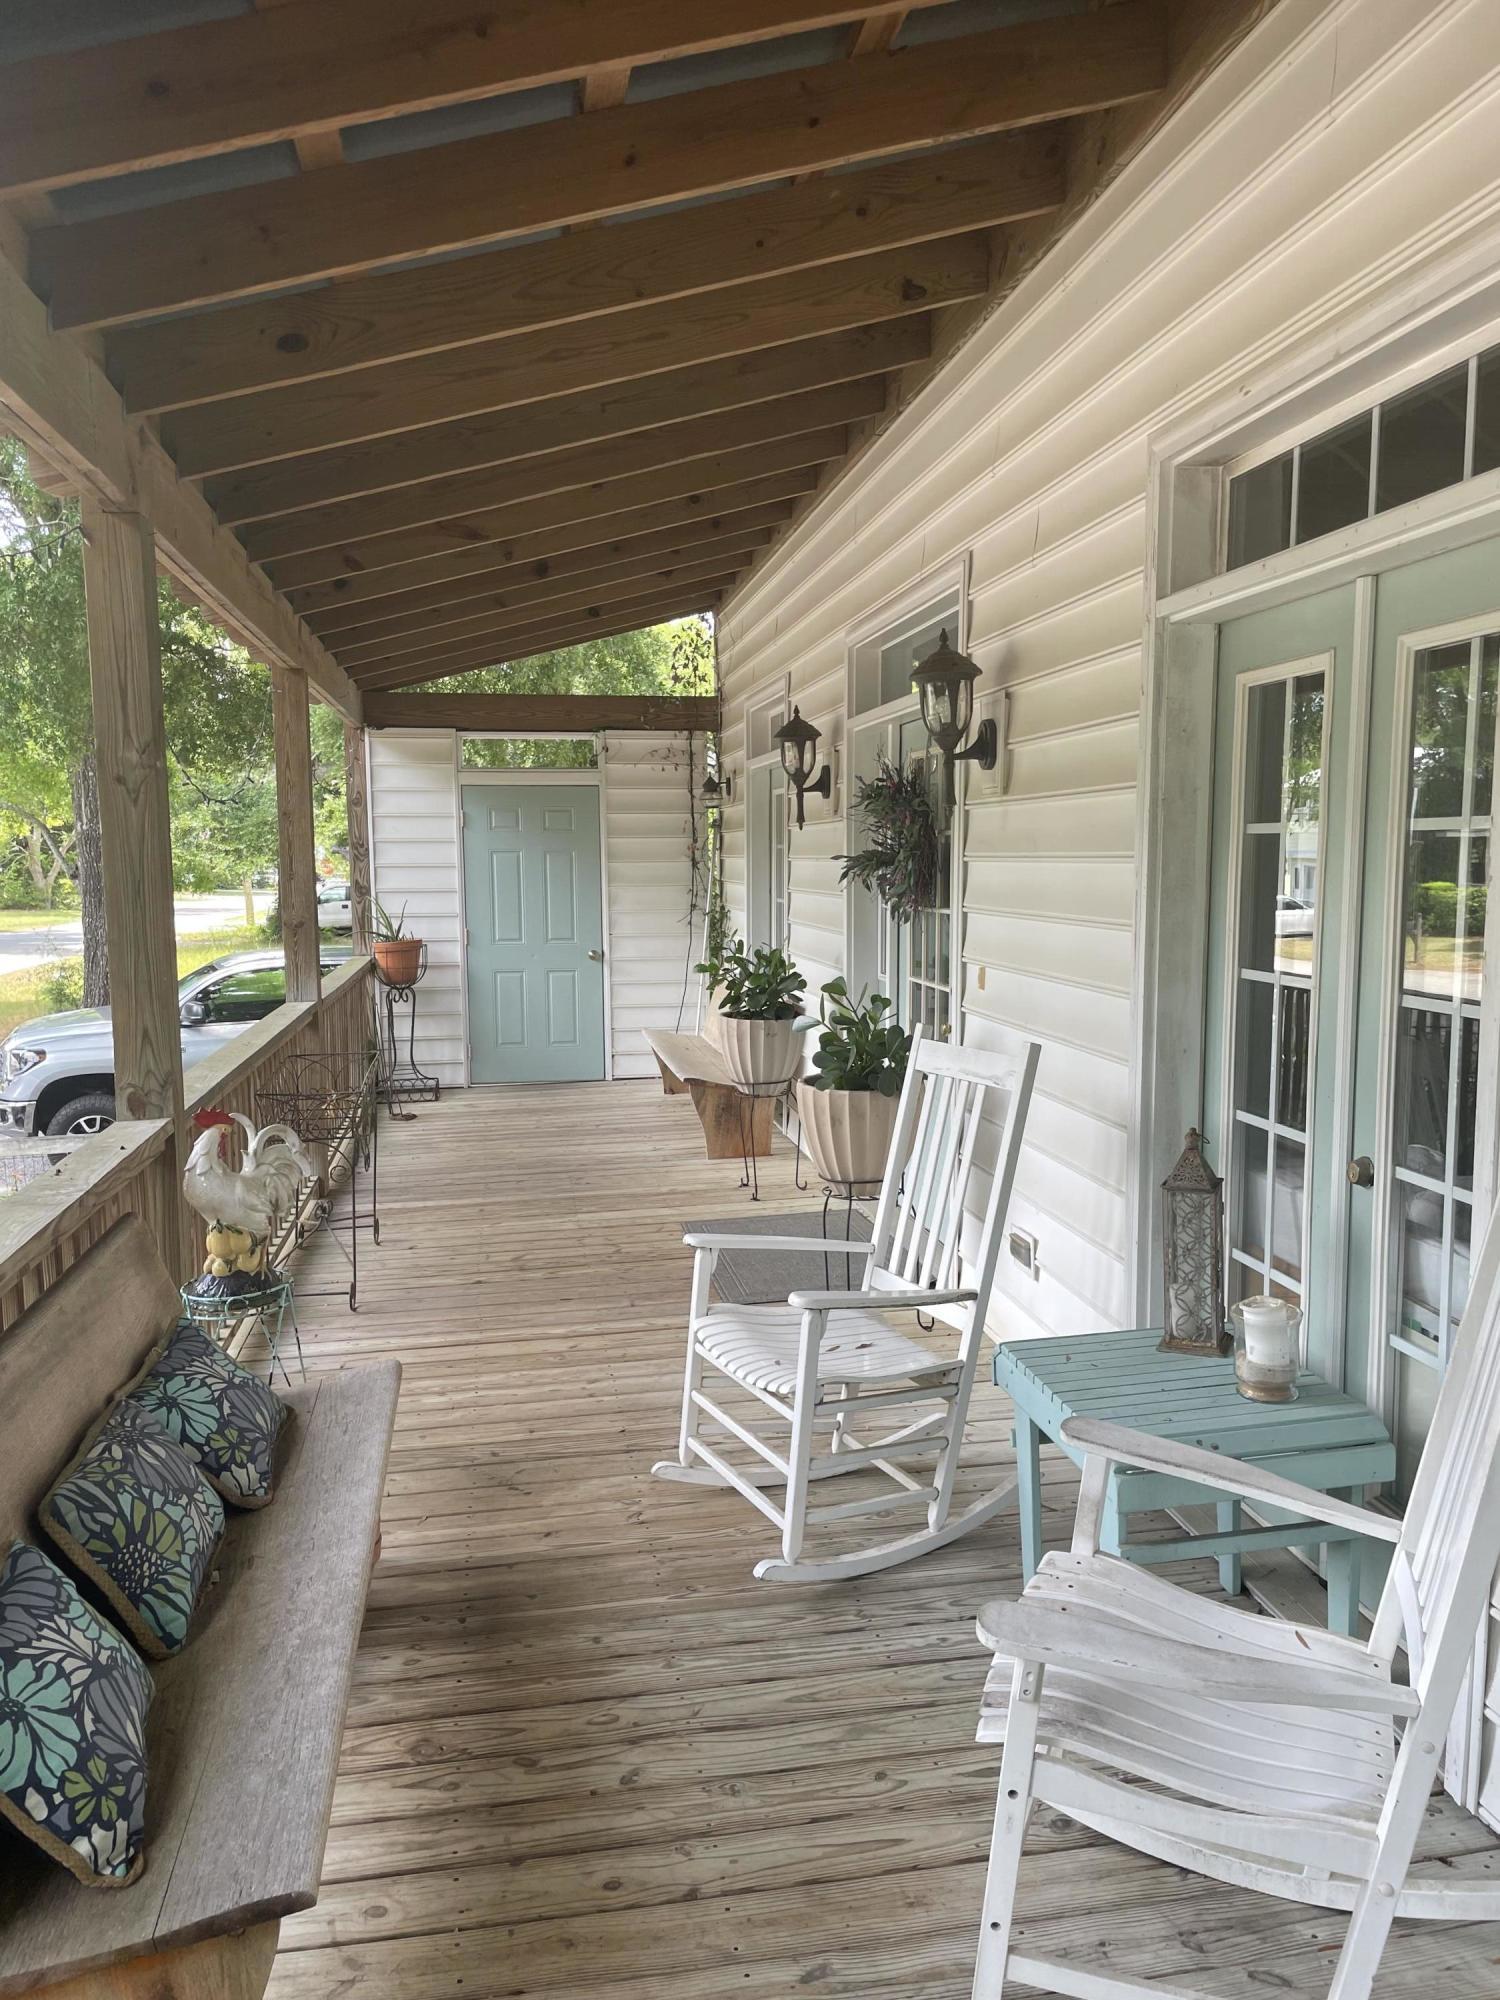 Old Mt Pleasant Homes For Sale - 703 Atlantic, Mount Pleasant, SC - 16